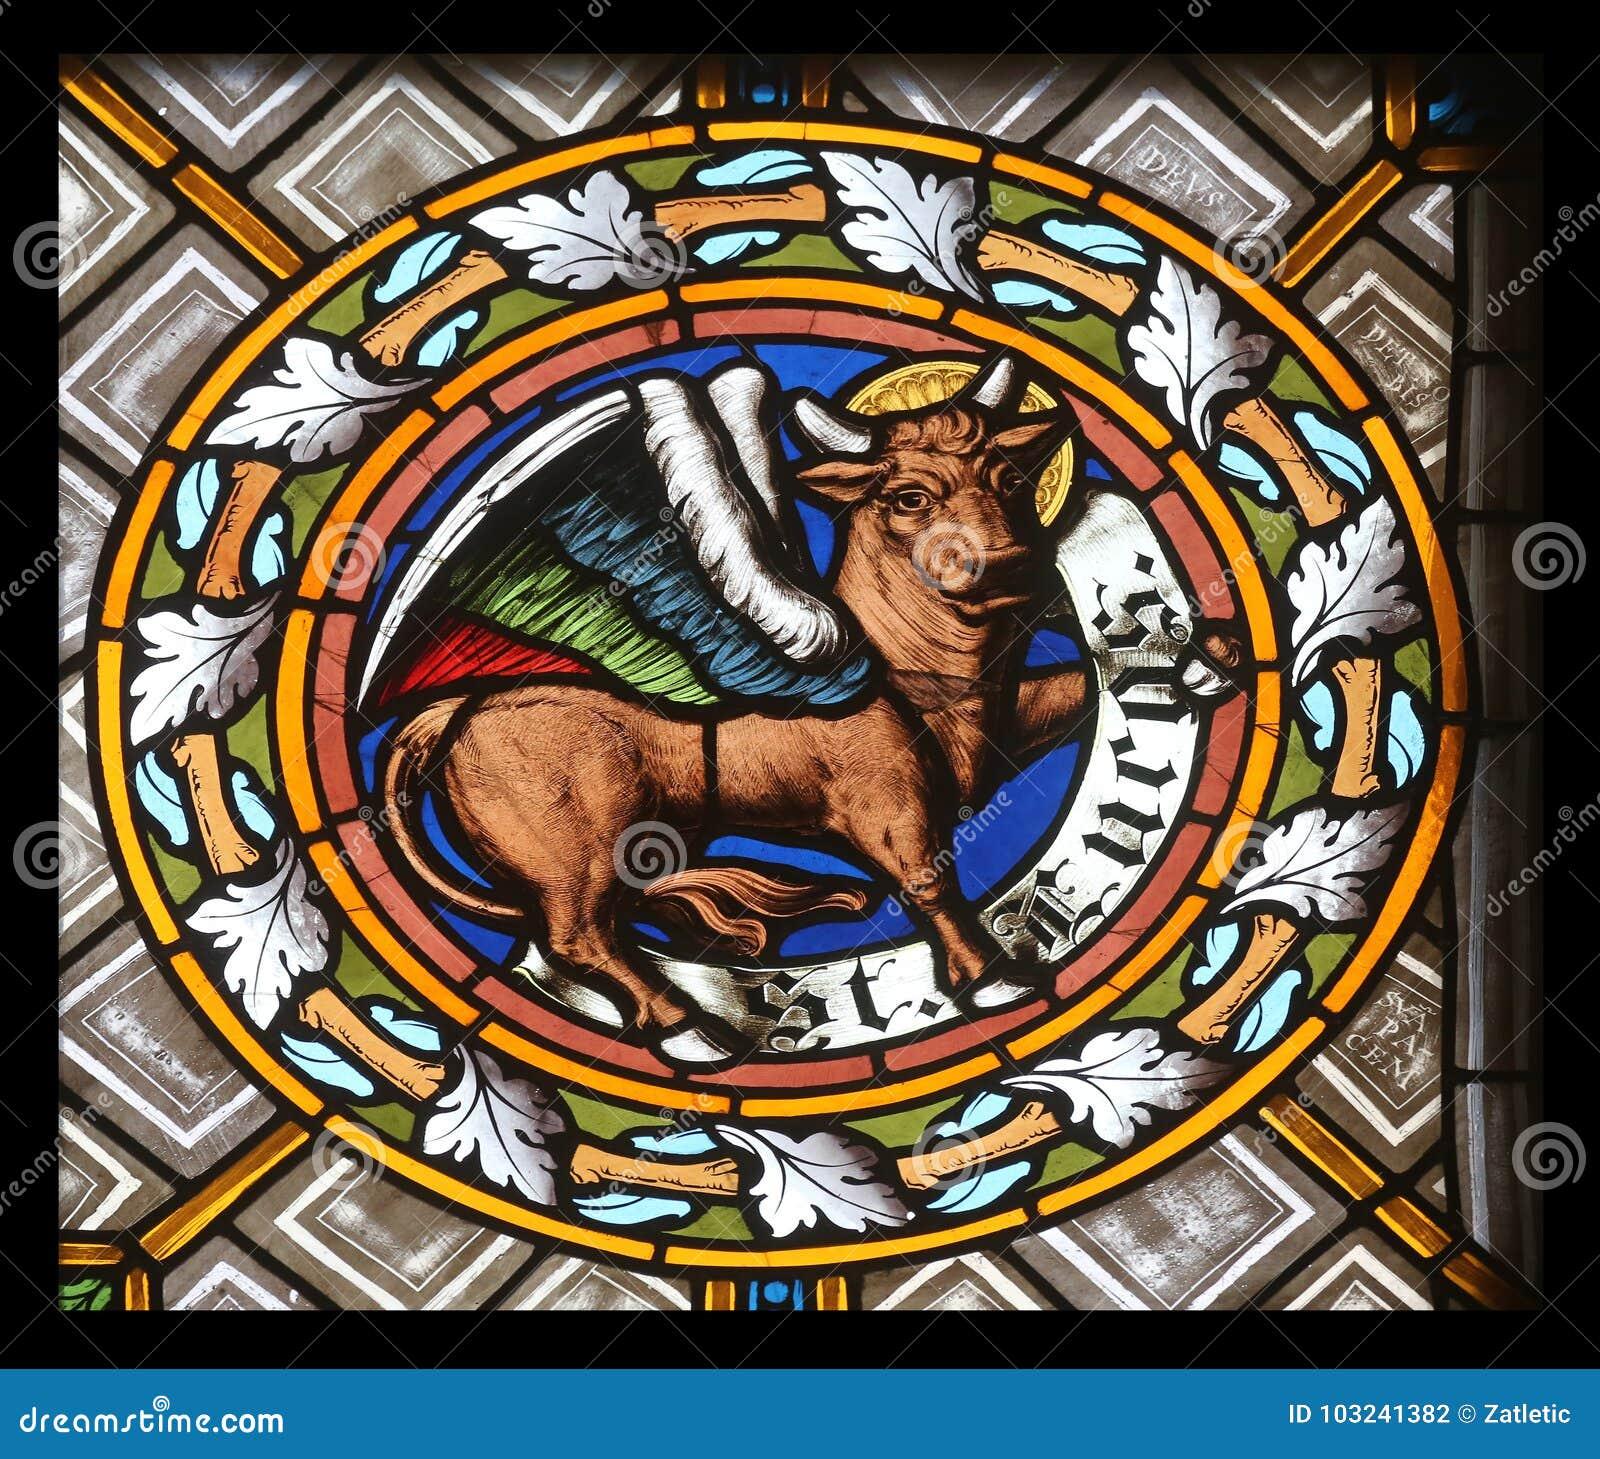 Symbol Of The Saint Luke The Evangelist Stock Photo Image Of